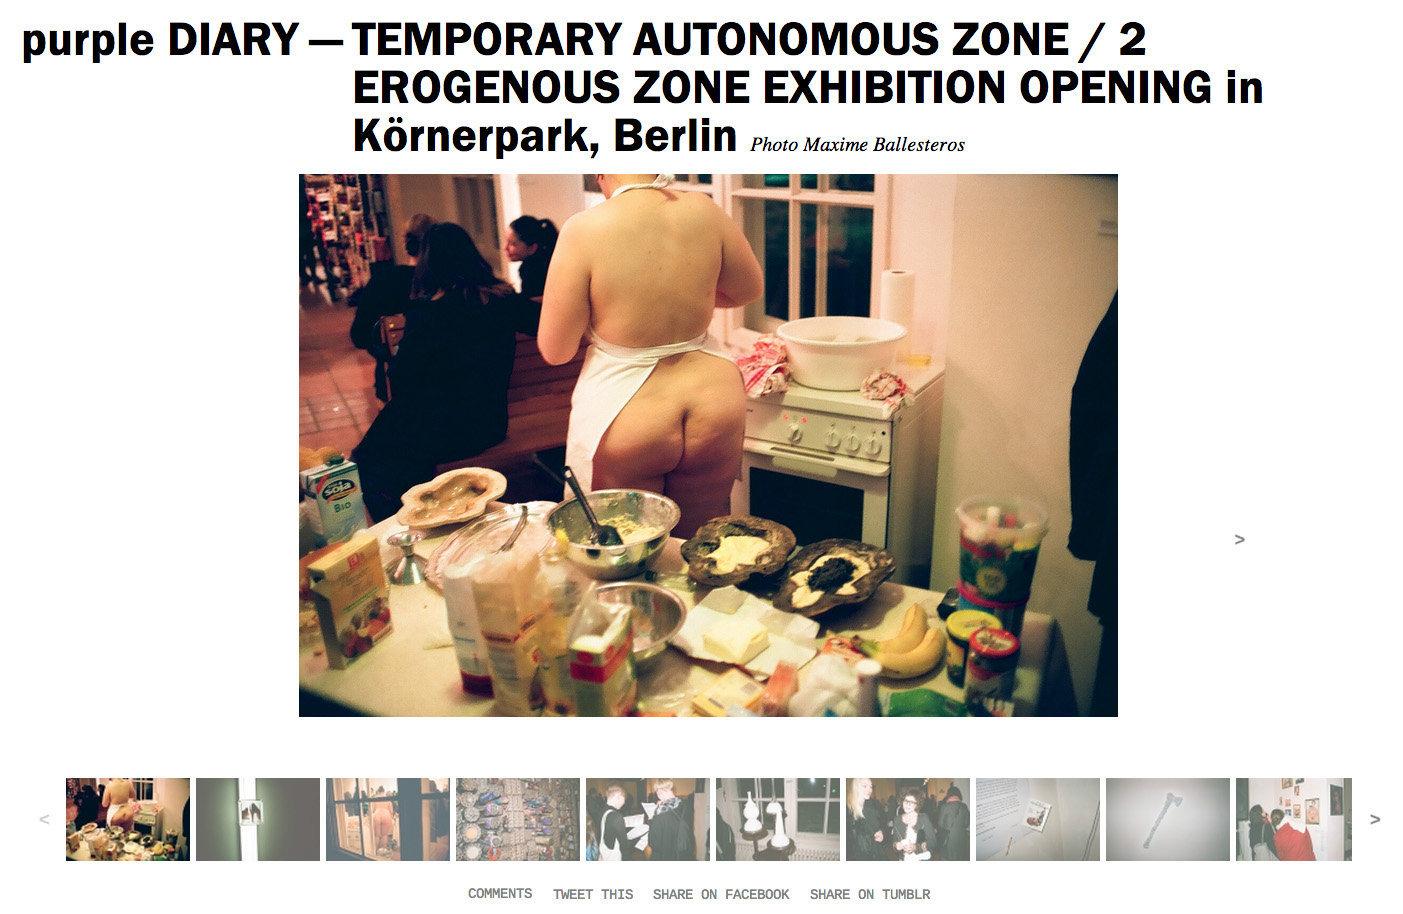 purple DIARY   TEMPORARY AUTONOMOUS ZONE   2 EROGENOUS ZONE EXHIBITION OPENING in Körnerpark  Berli